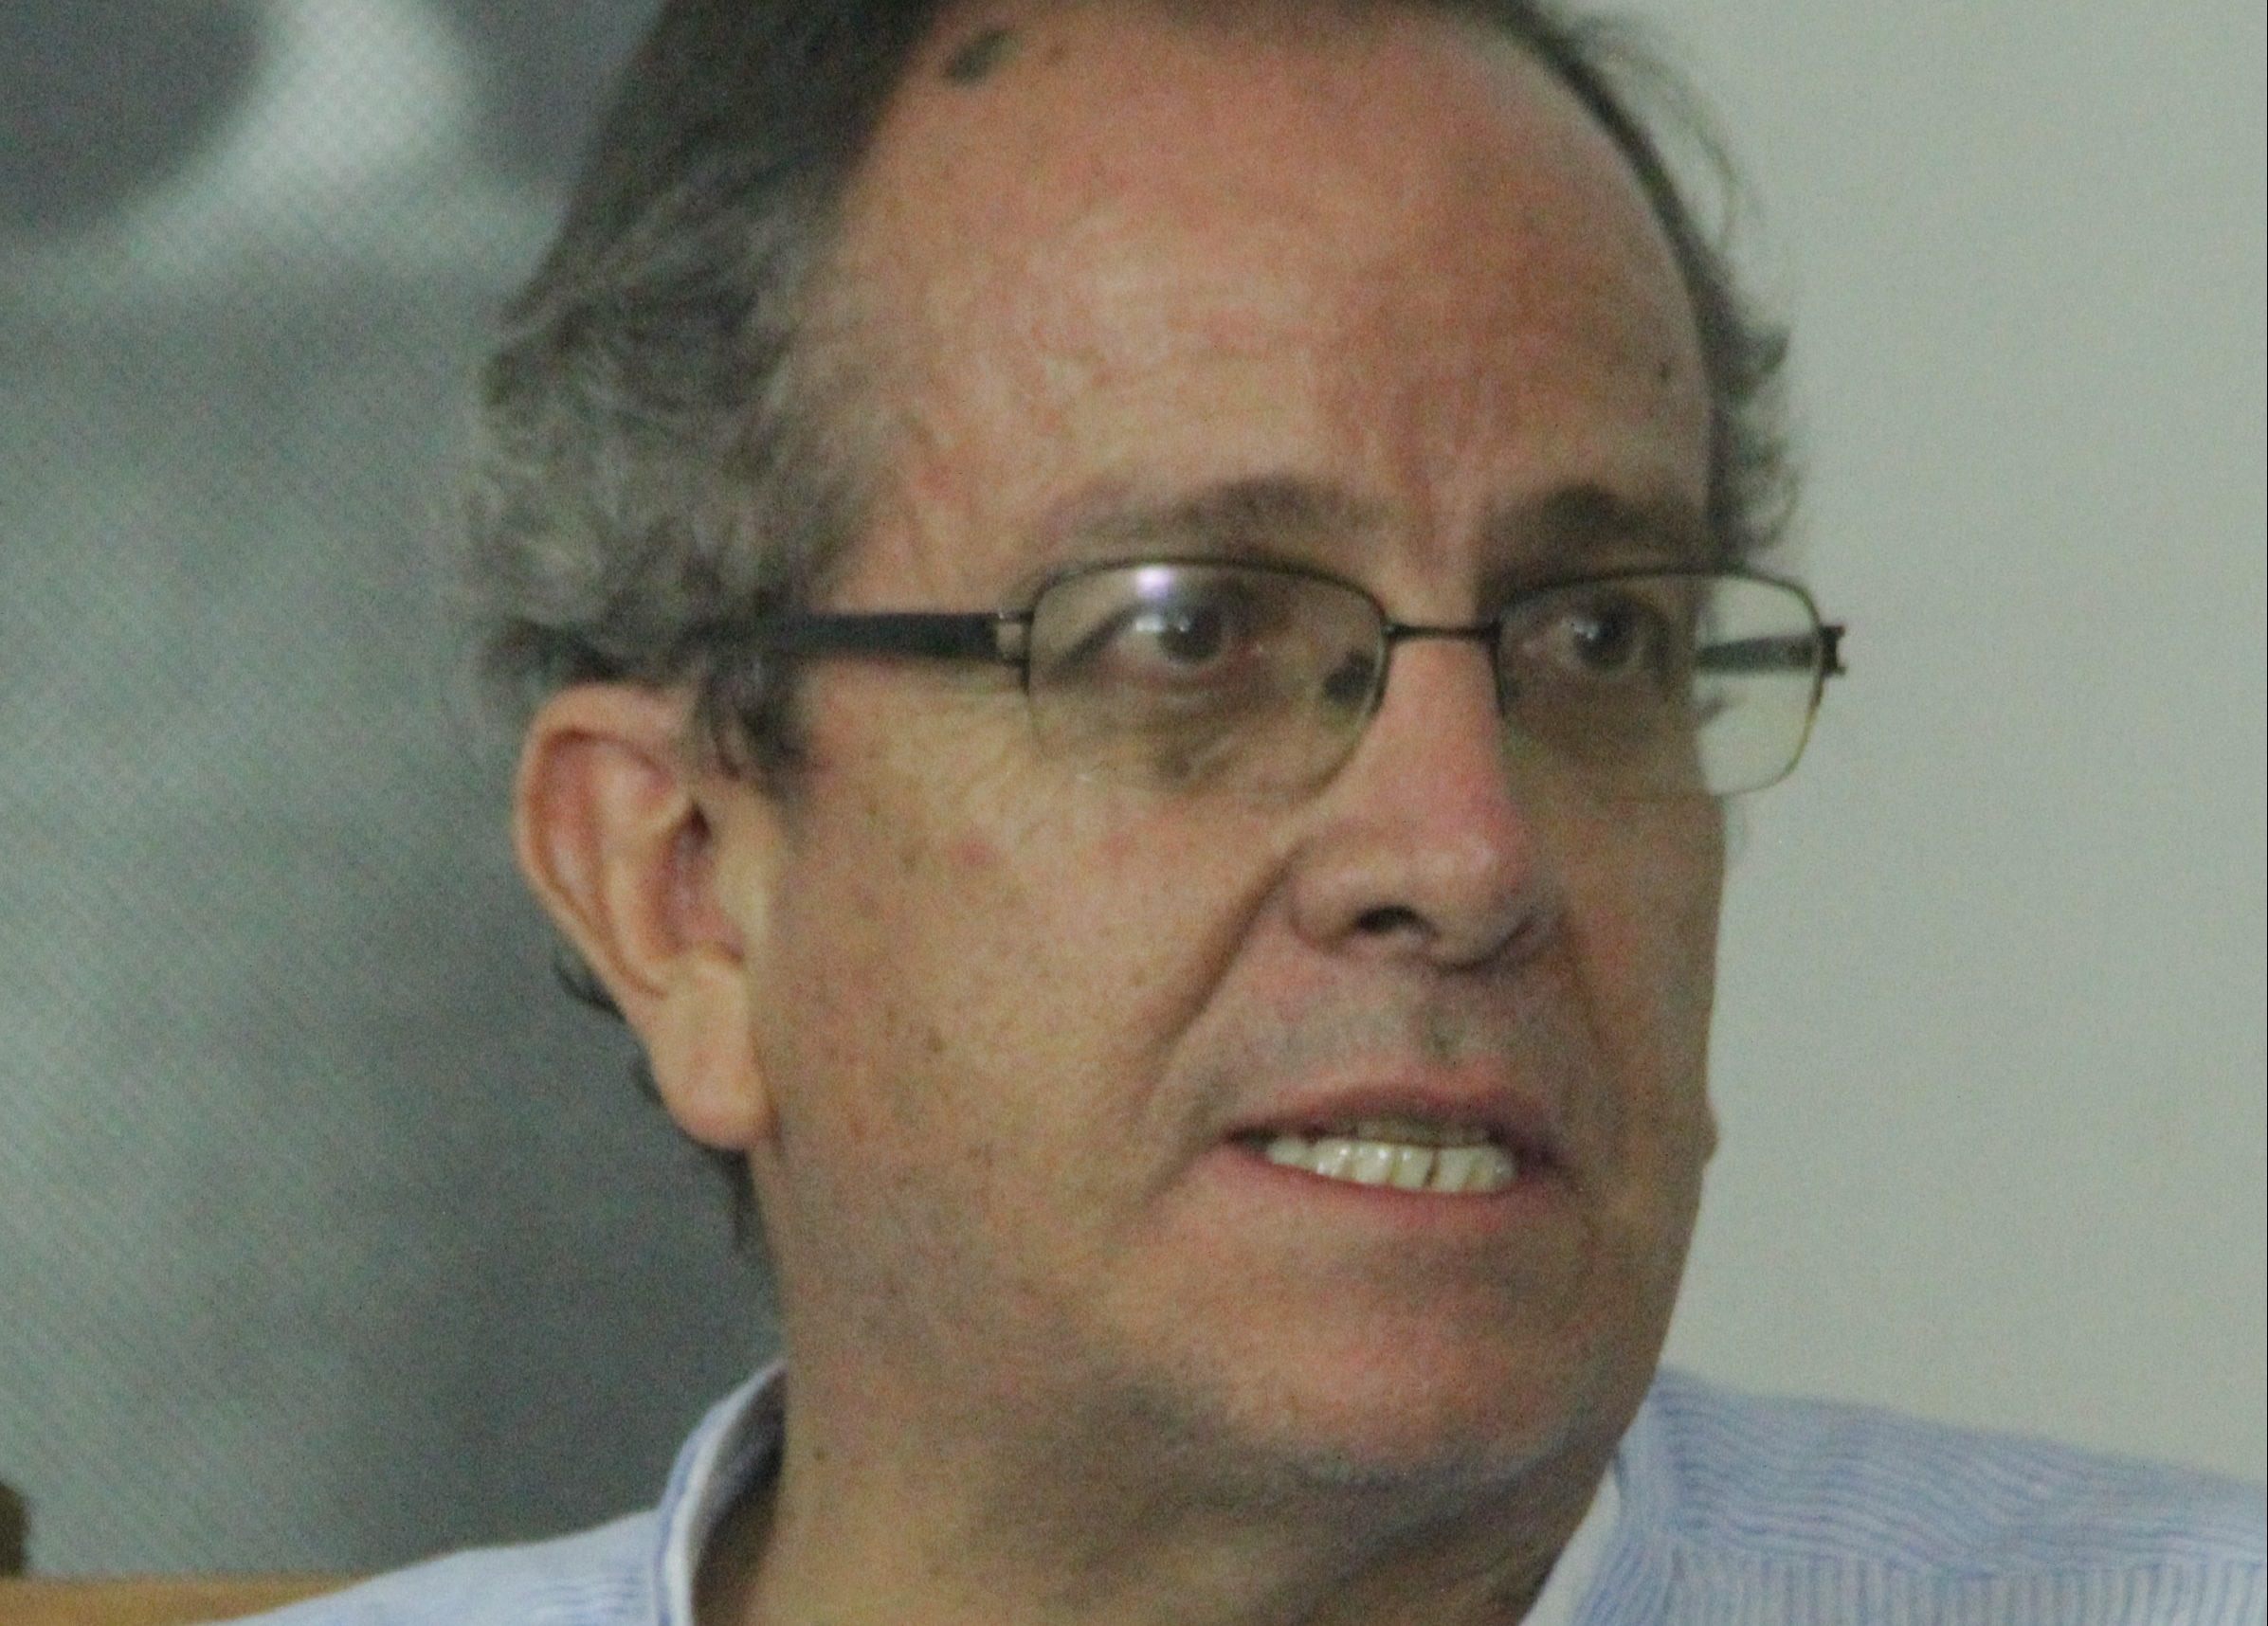 Alberto_Acosta_(detalle)